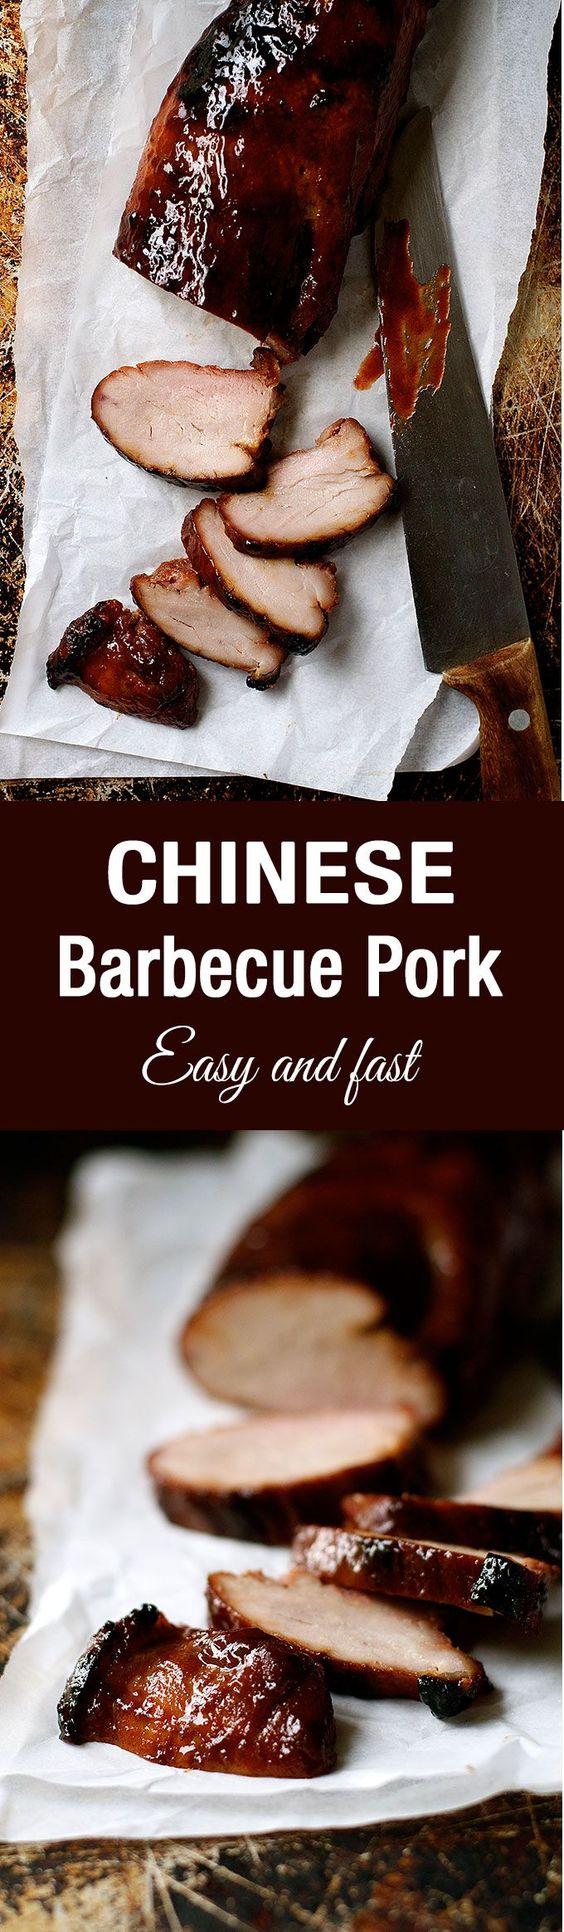 Chinese Barbecue Pork | Char Siu | Recipe | Char Siu, Bbq ...